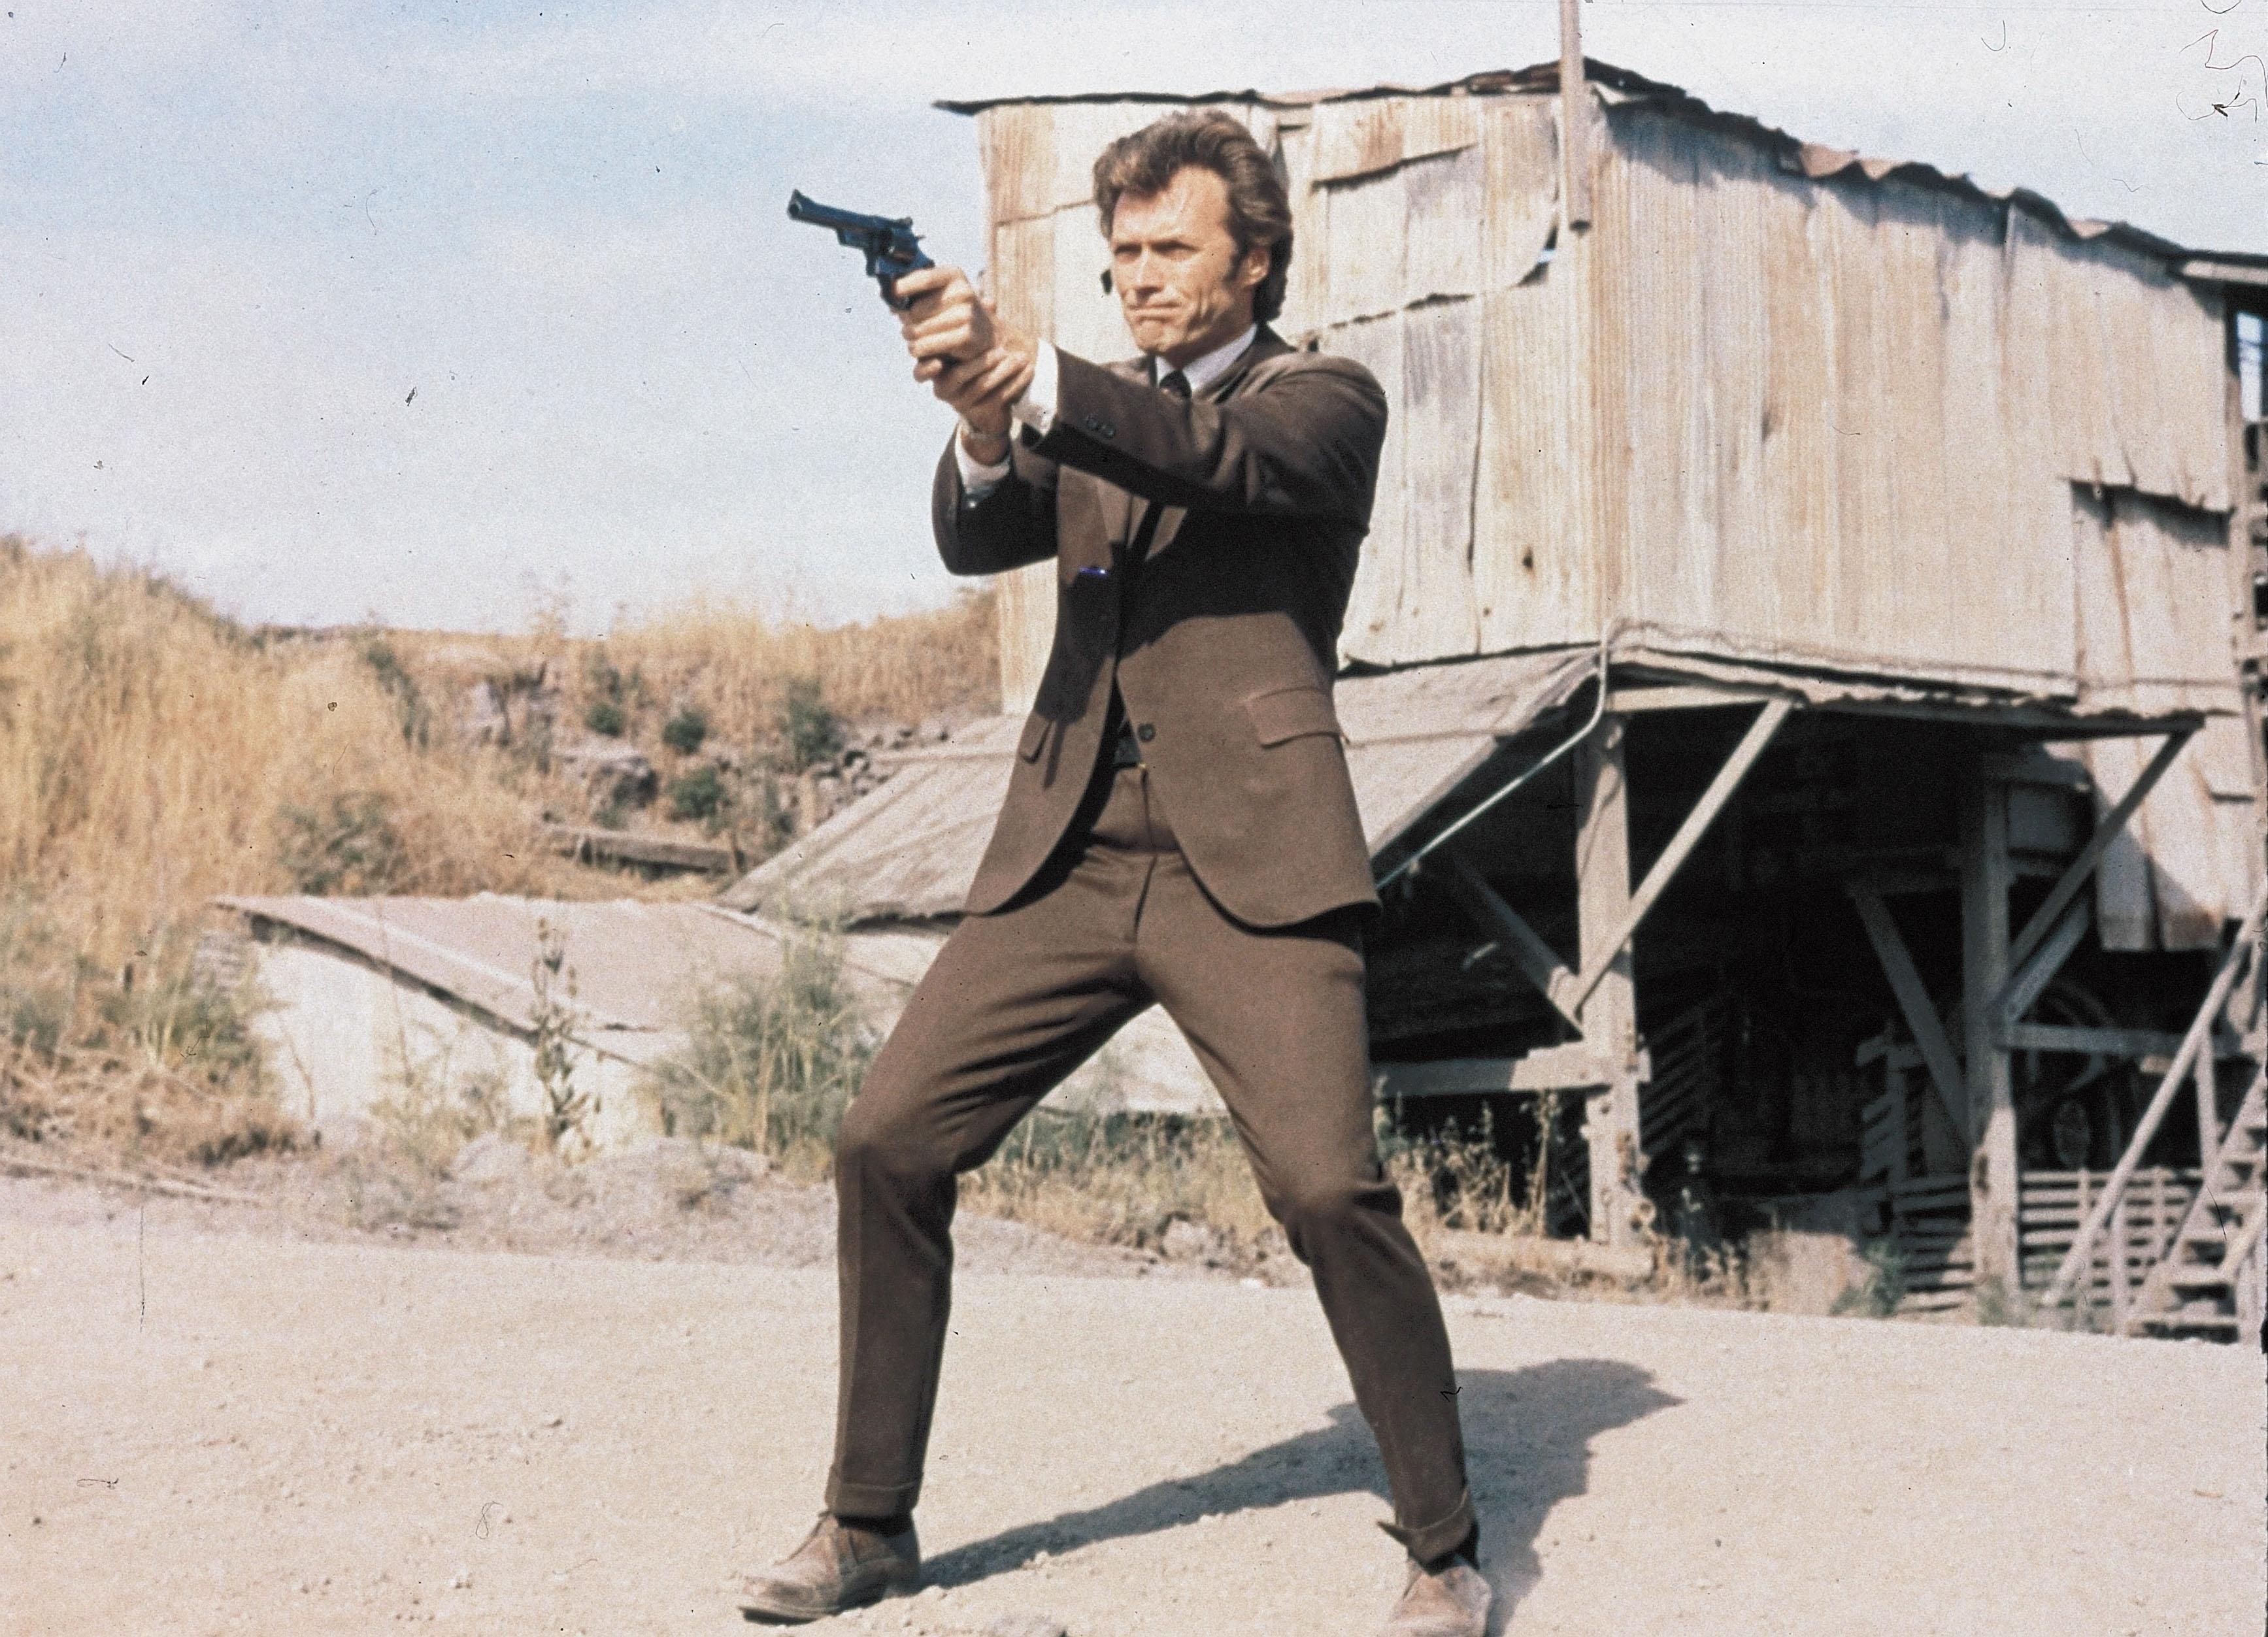 10 personajes míticos de Clint Eastwood: De Harry Callahan a Walt Kowalski